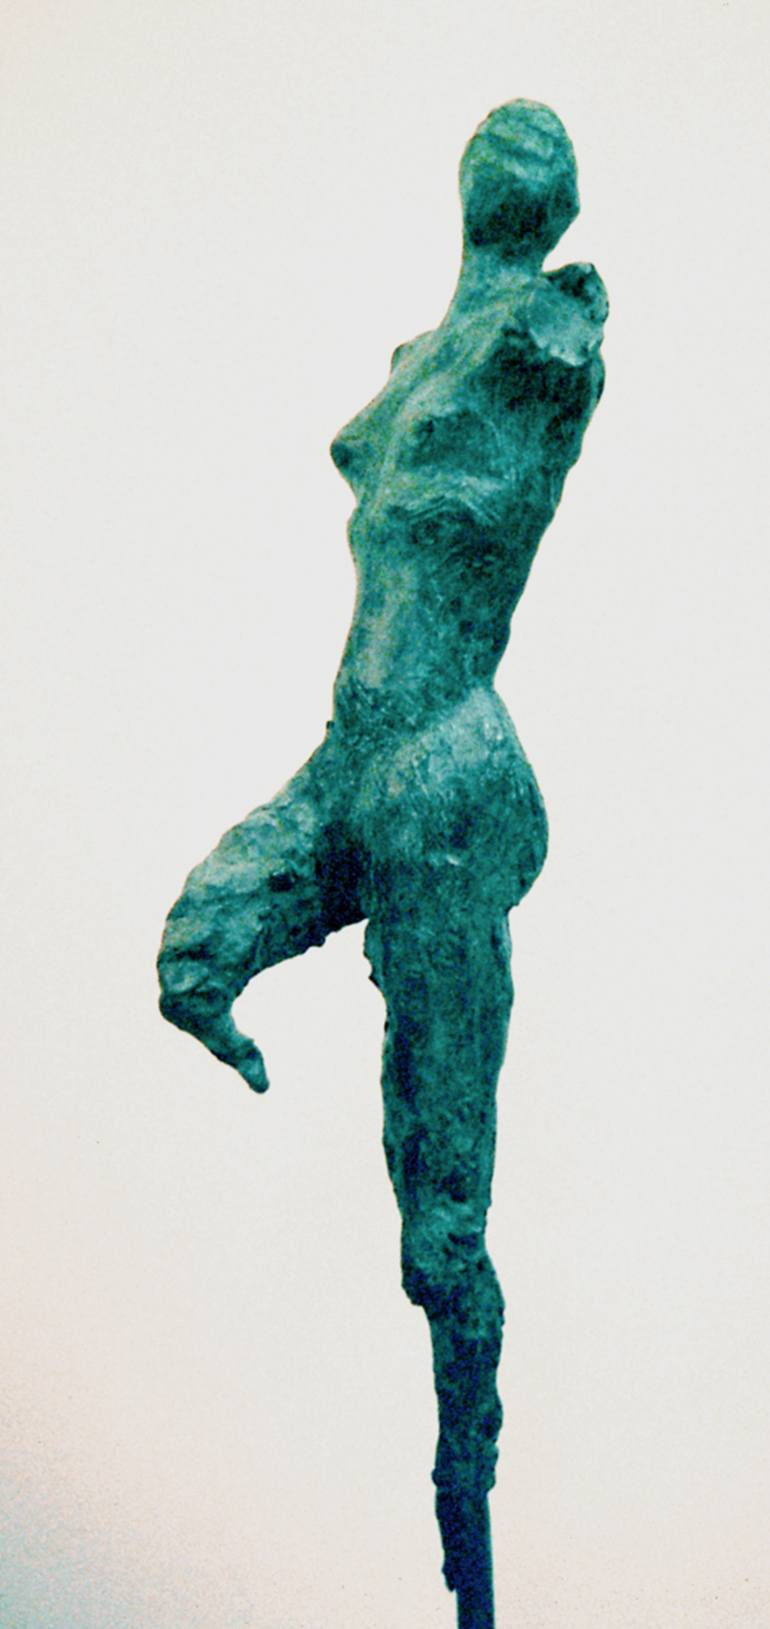 Gerald Siciliano | STANDING STUDY II (the dancer)